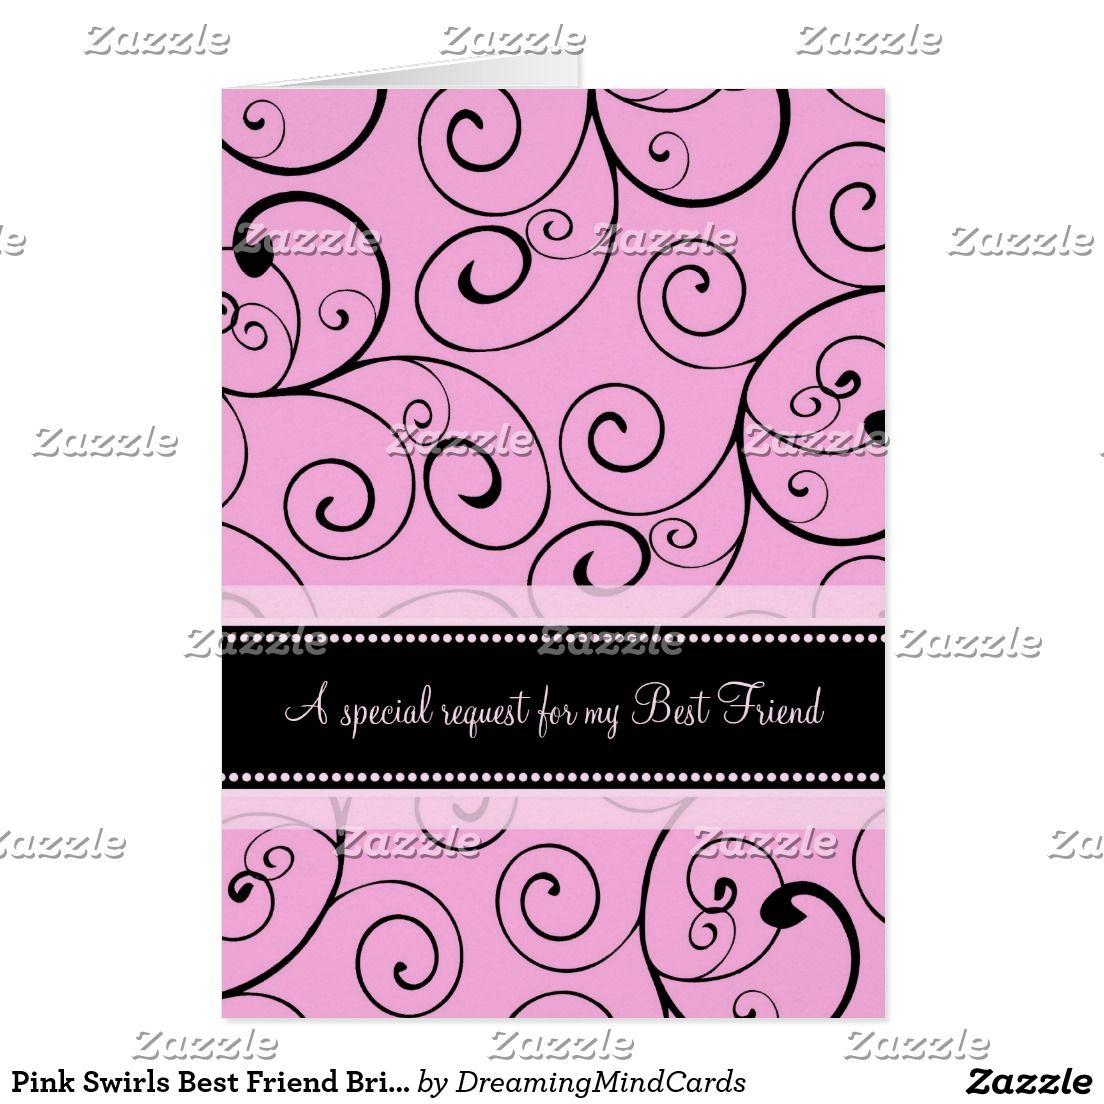 Pink Swirls Best Friend Bridesmaid Invitation Card Zazzle